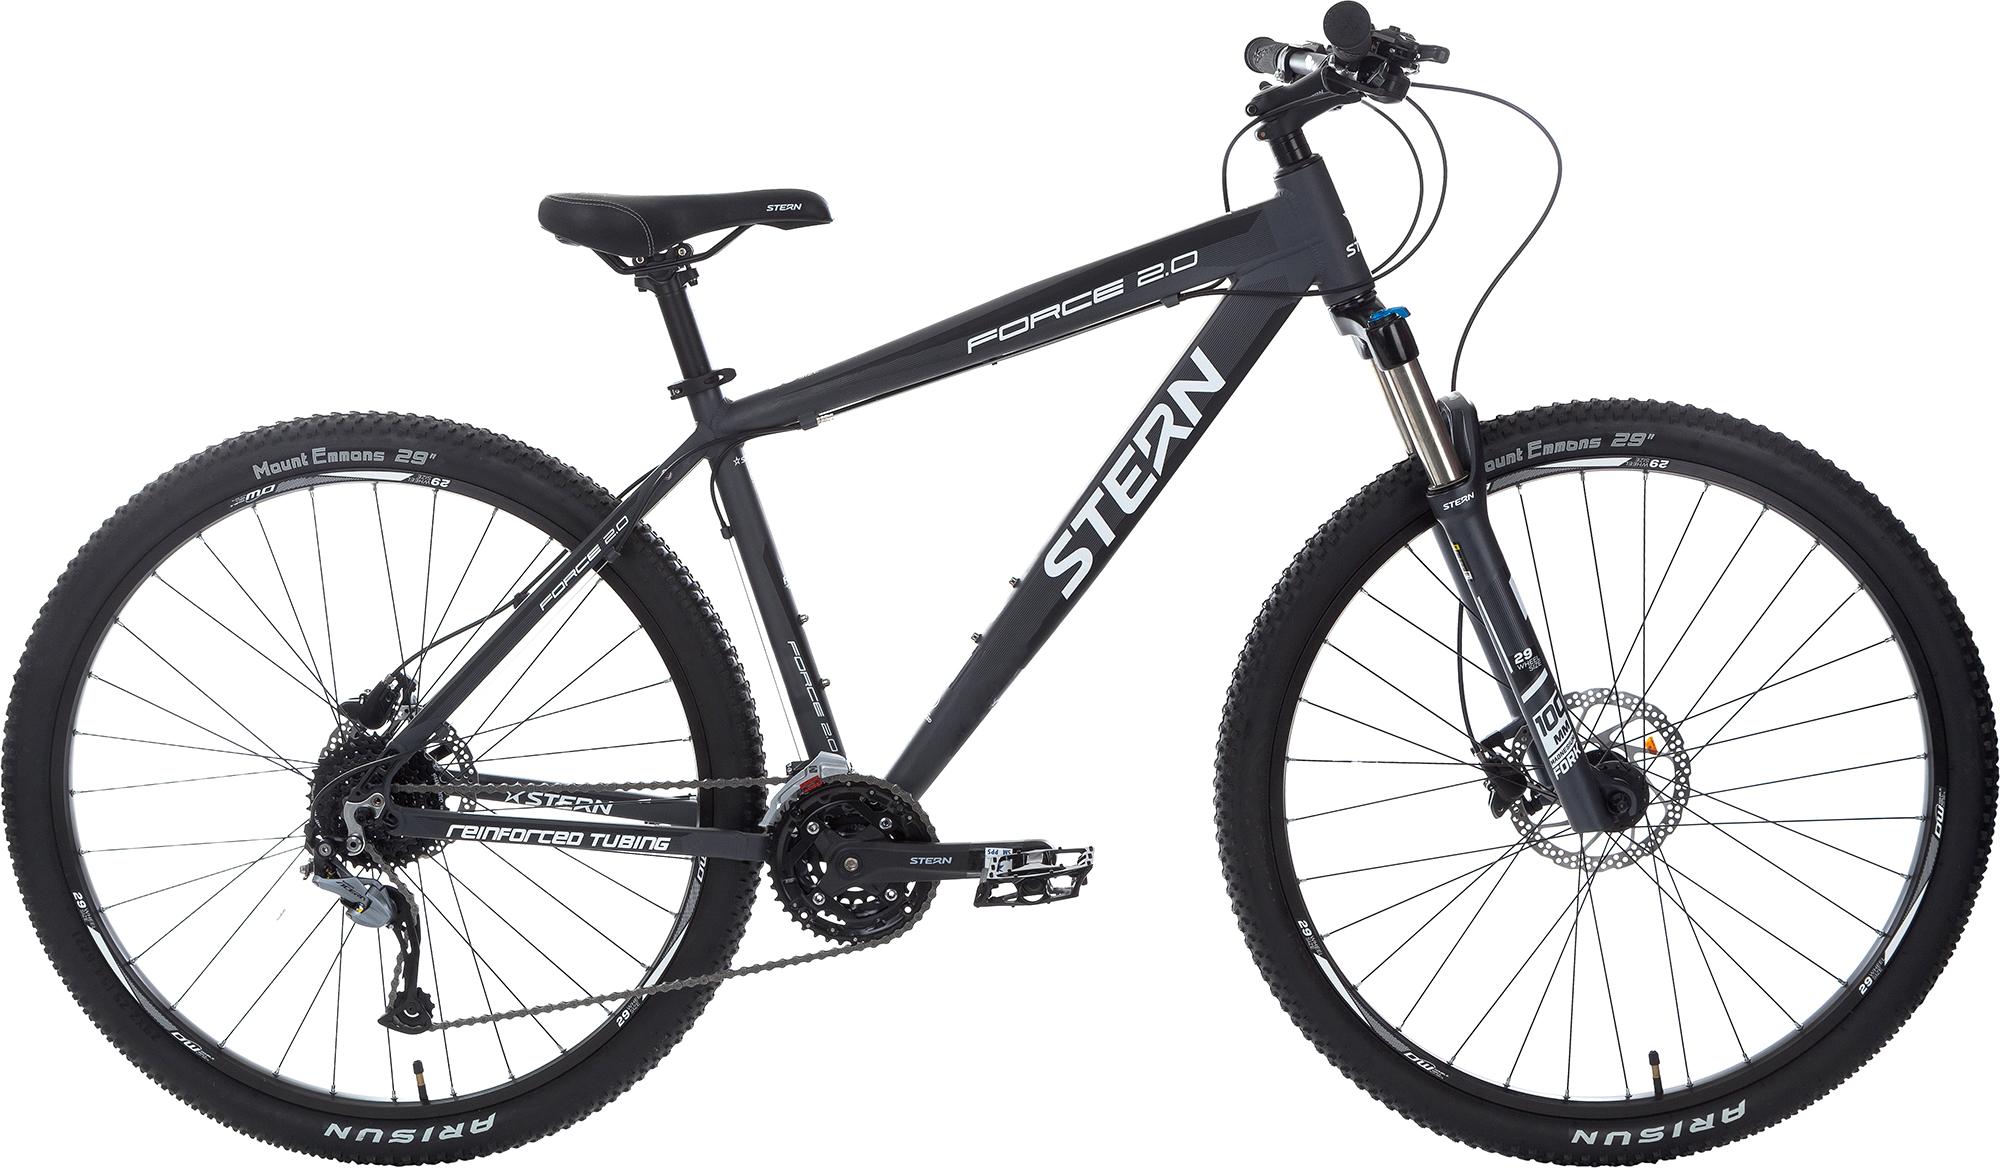 Stern Stern Force 2.0 29 (2018) набор аксессуаров для велосипеда stern 90561